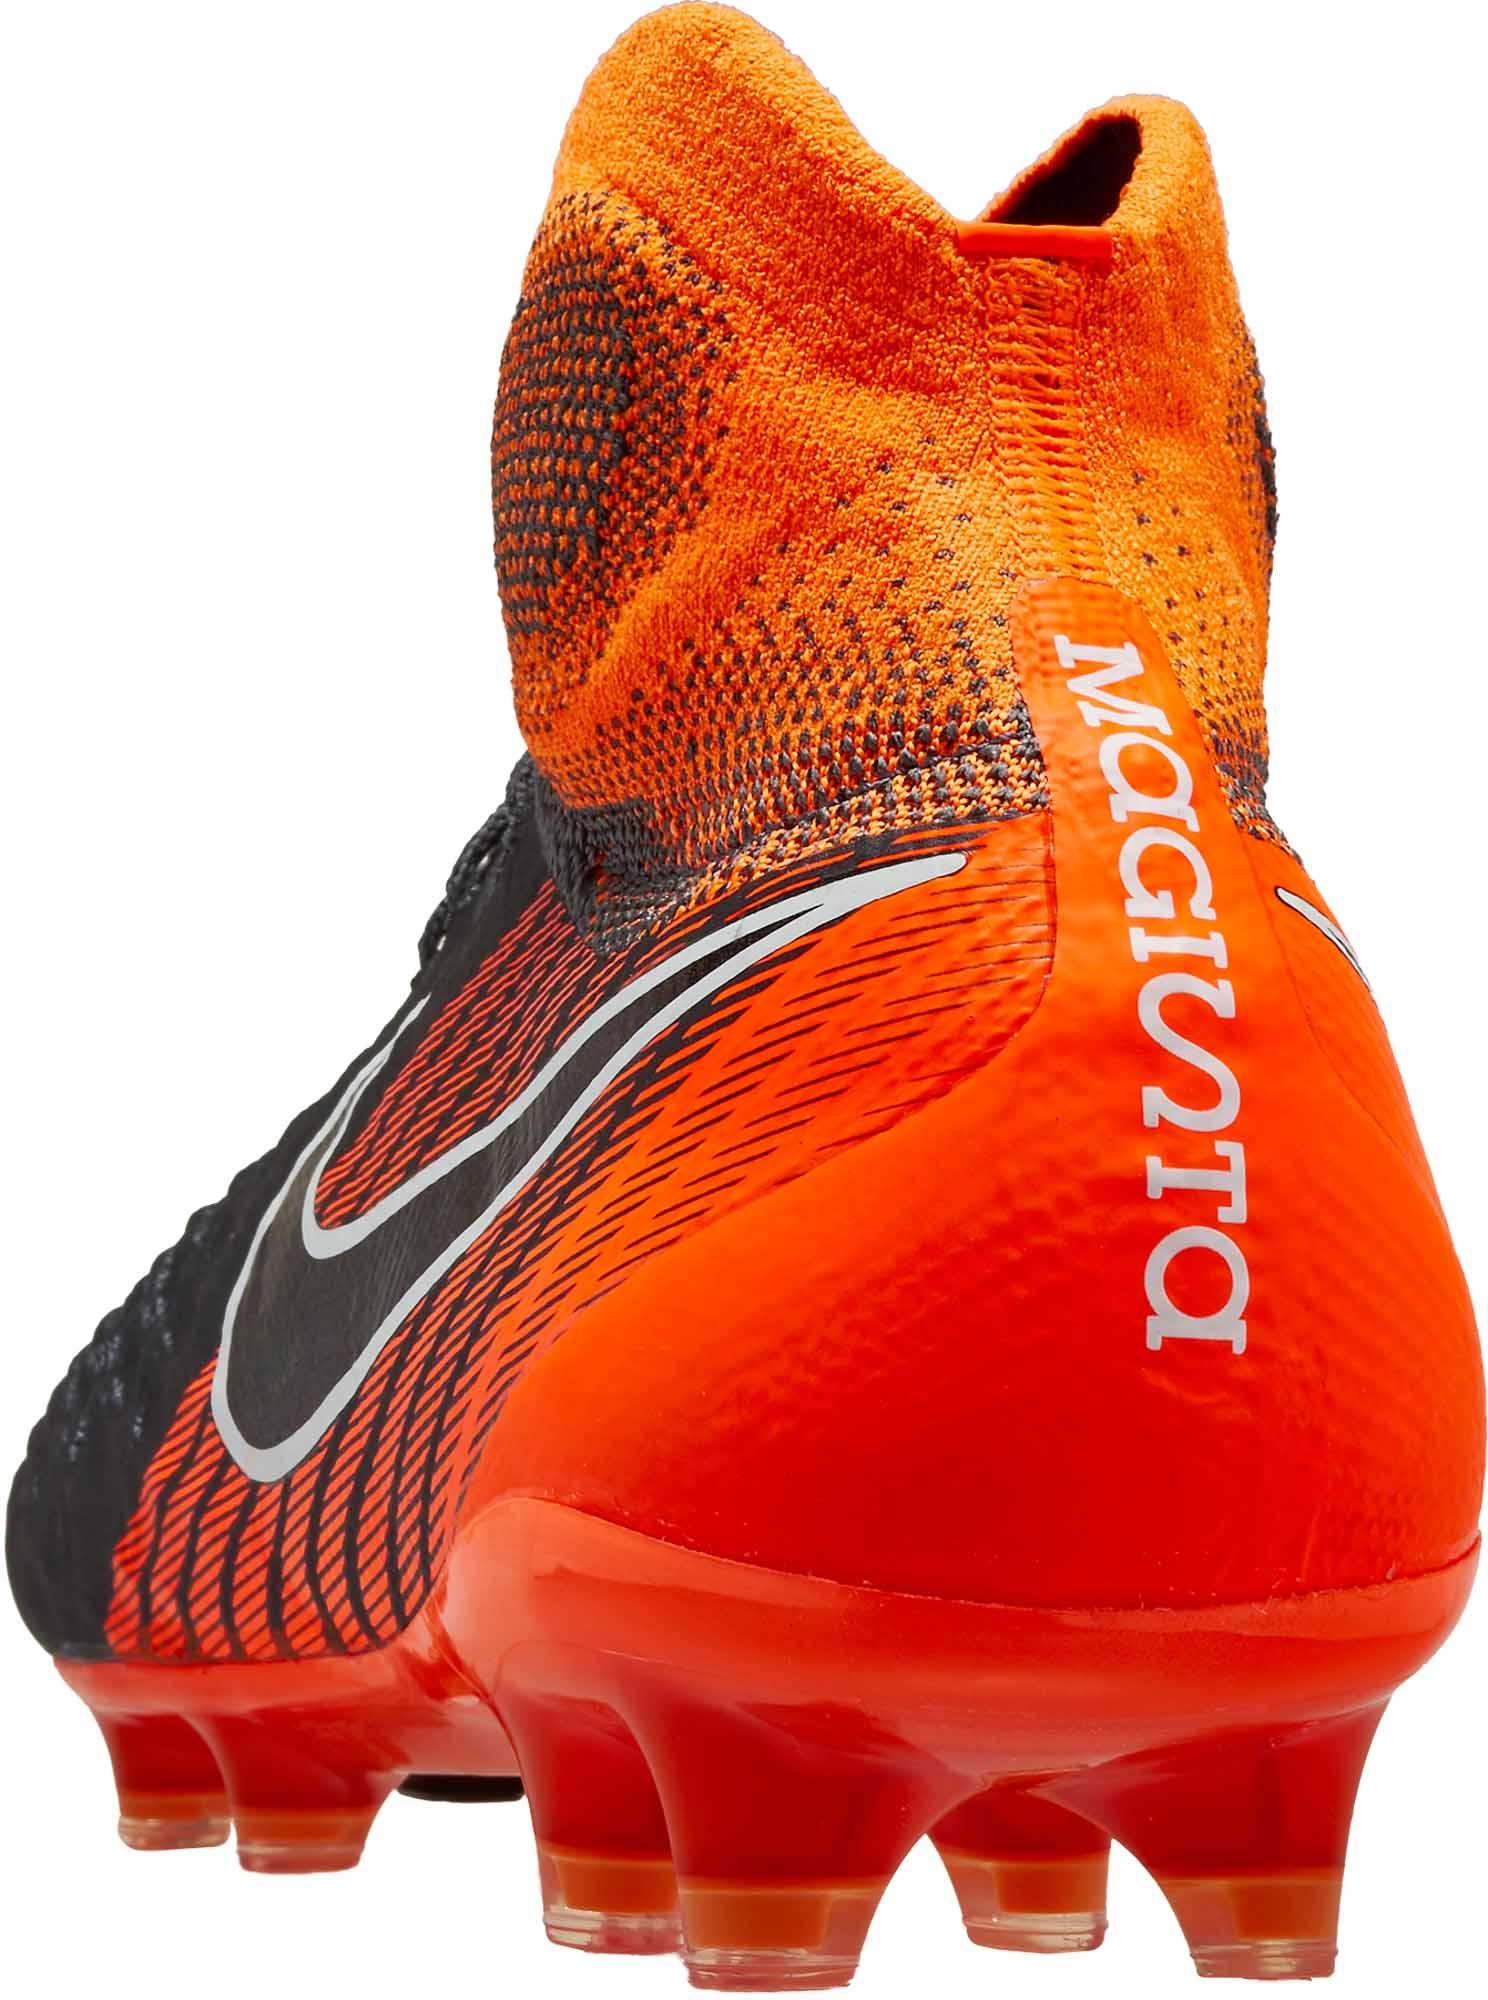 vente chaude en ligne 0f6d4 490dd Nike Magista Obra 2 Elite DF FG - Dark Grey & Total Orange ...